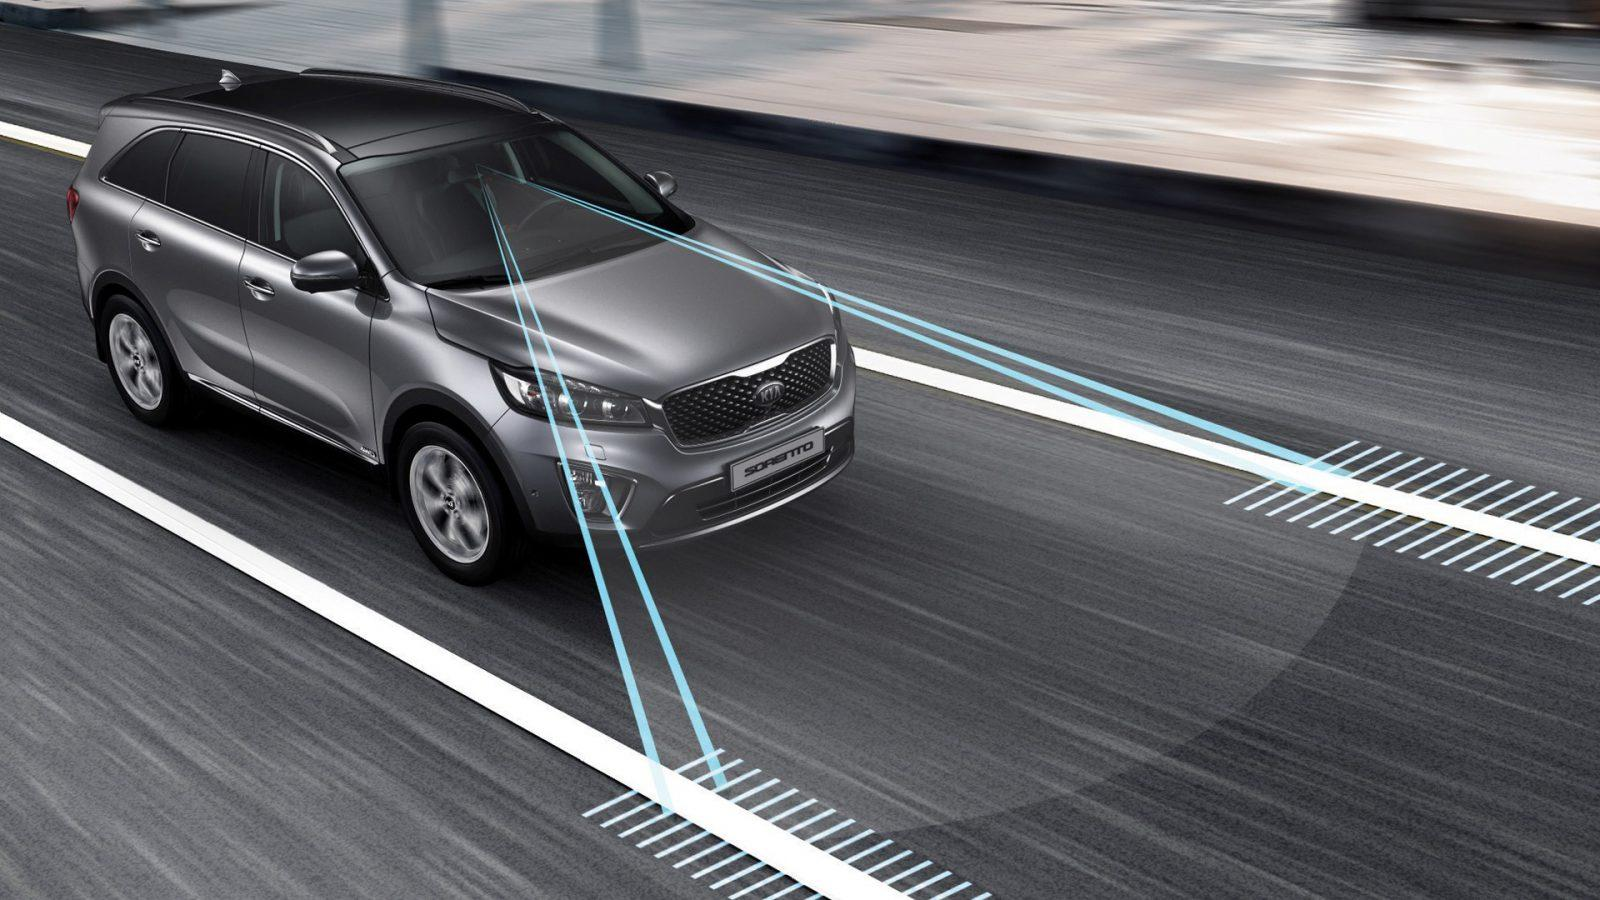 lane keeping assist pavement marking